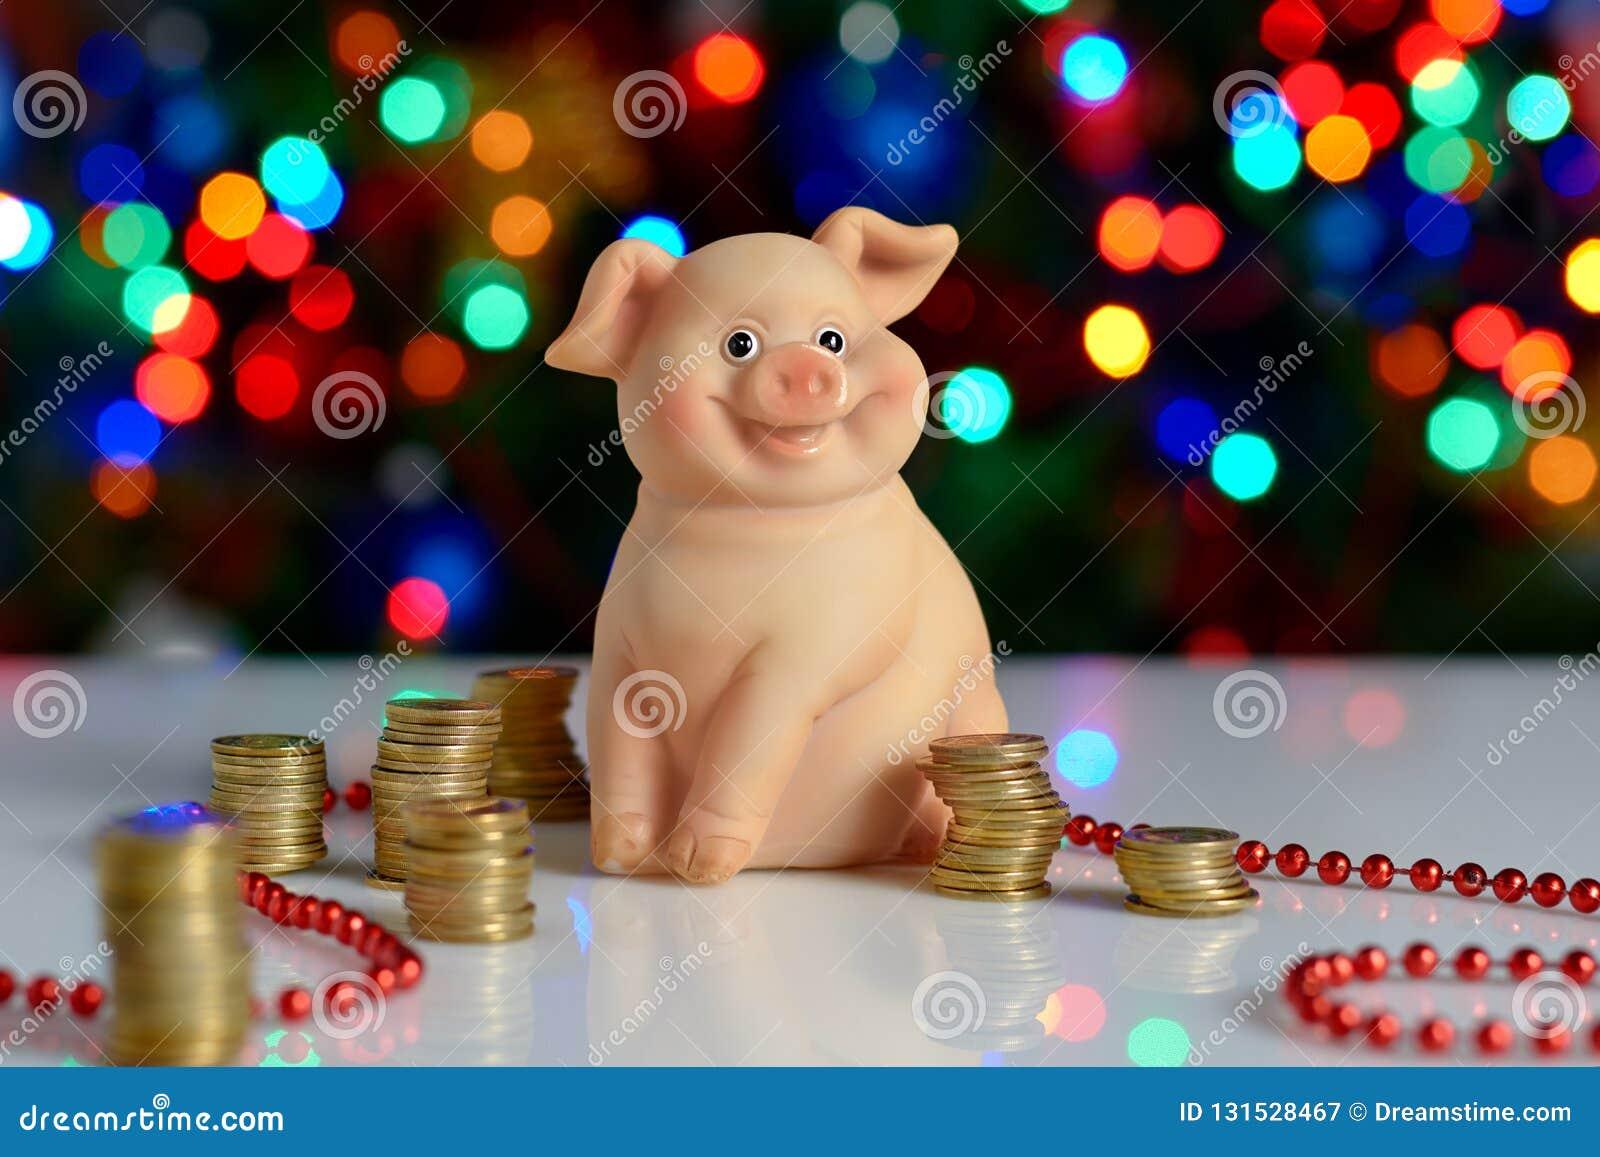 Christmas 2019 Bank Holidays.Christmas New Year Piggy Bank Holiday 2019 The Year Of